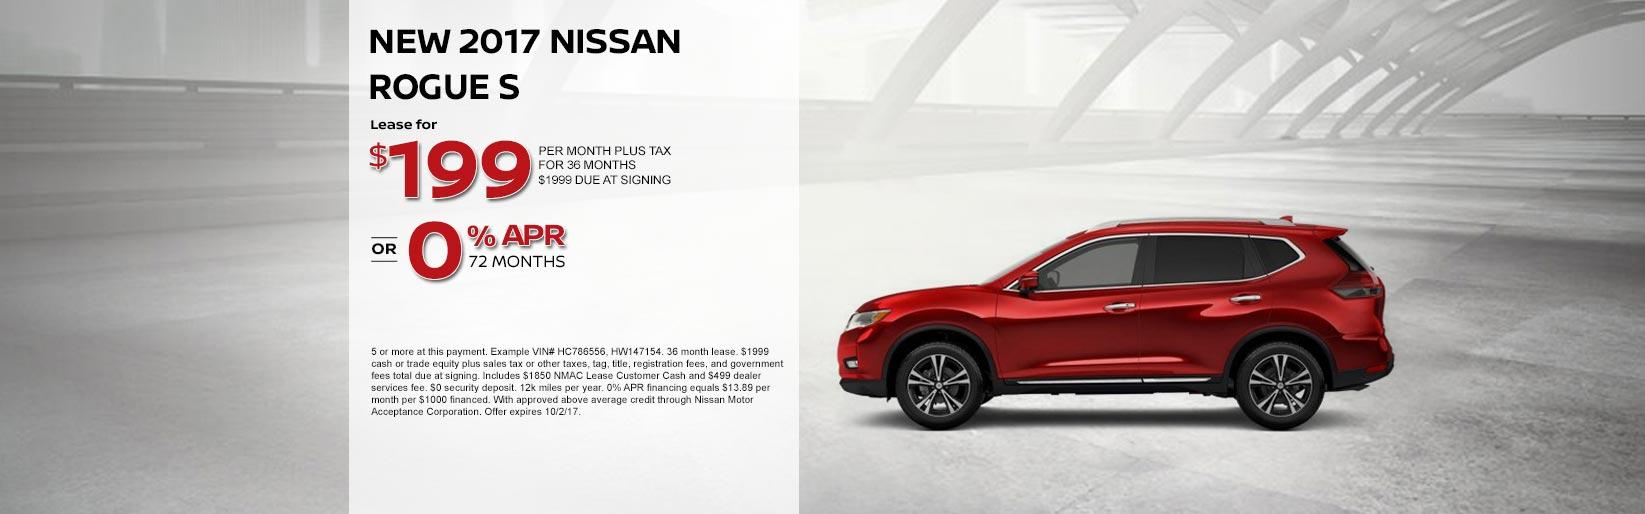 Nissan dealership near me in chandler autonation nissan chandler